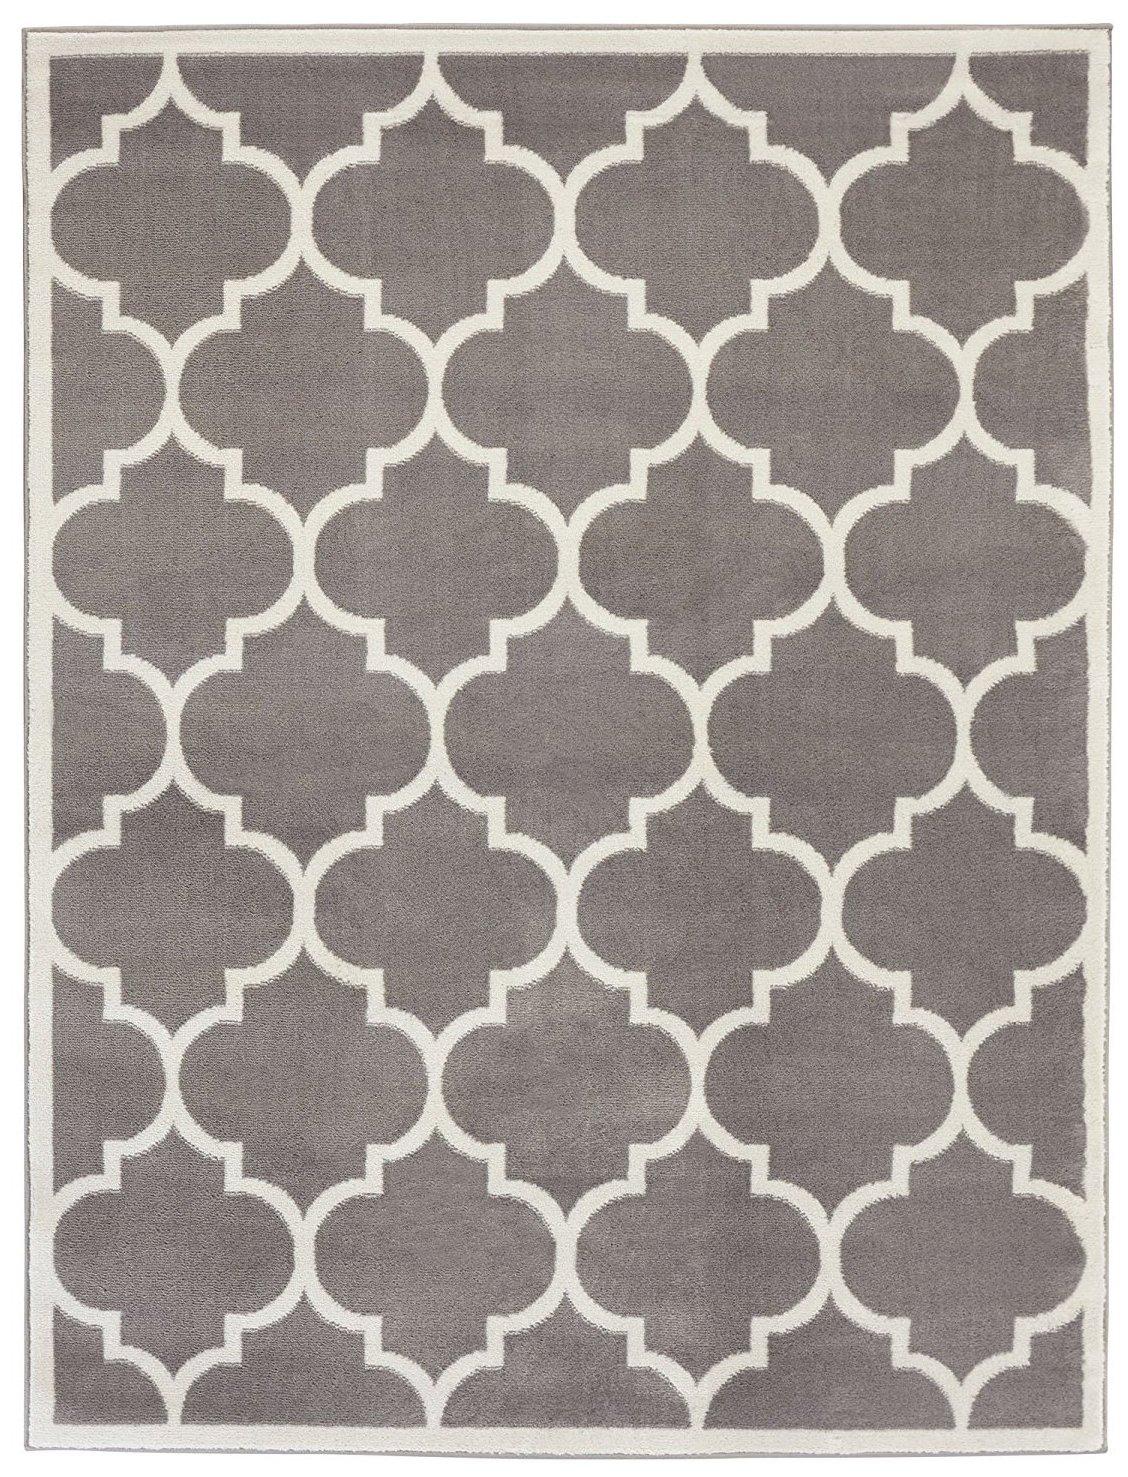 Sweet Home Stores Clifton Collection Light Grey Moroccan Trellis Design (8 x 10) Area Rug.